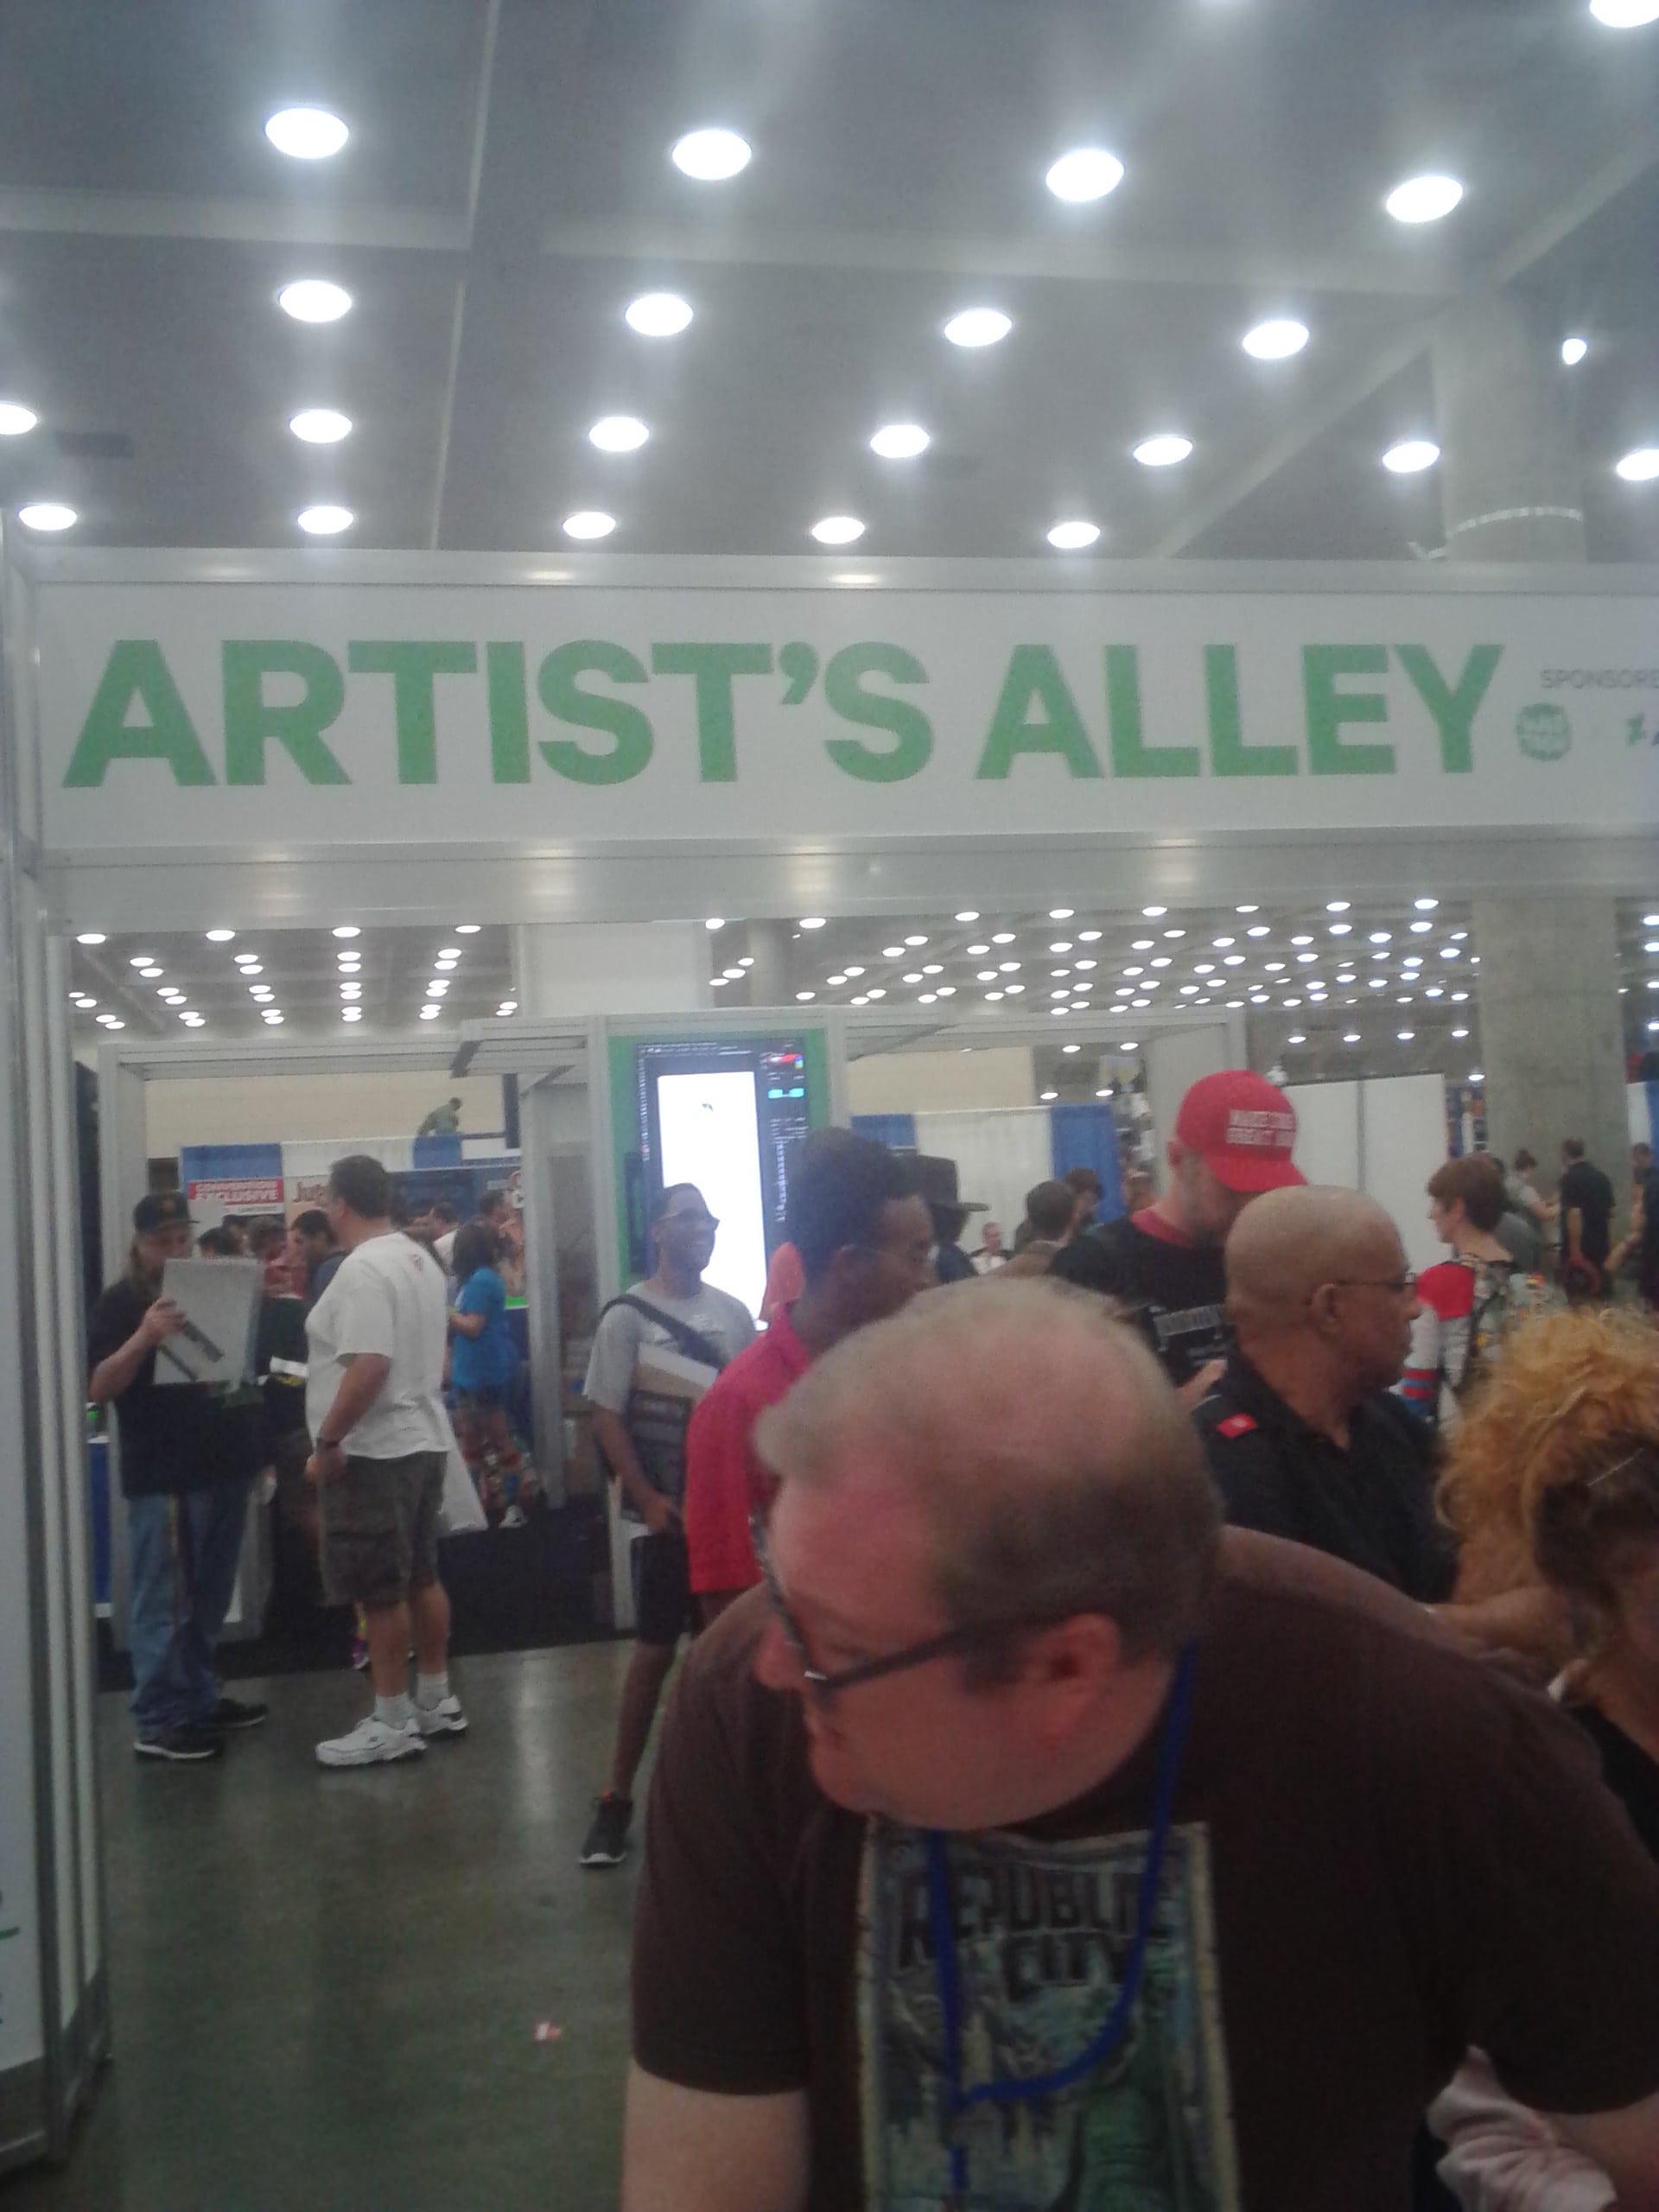 Baltimore comic con 2016 cosplay artist's alley